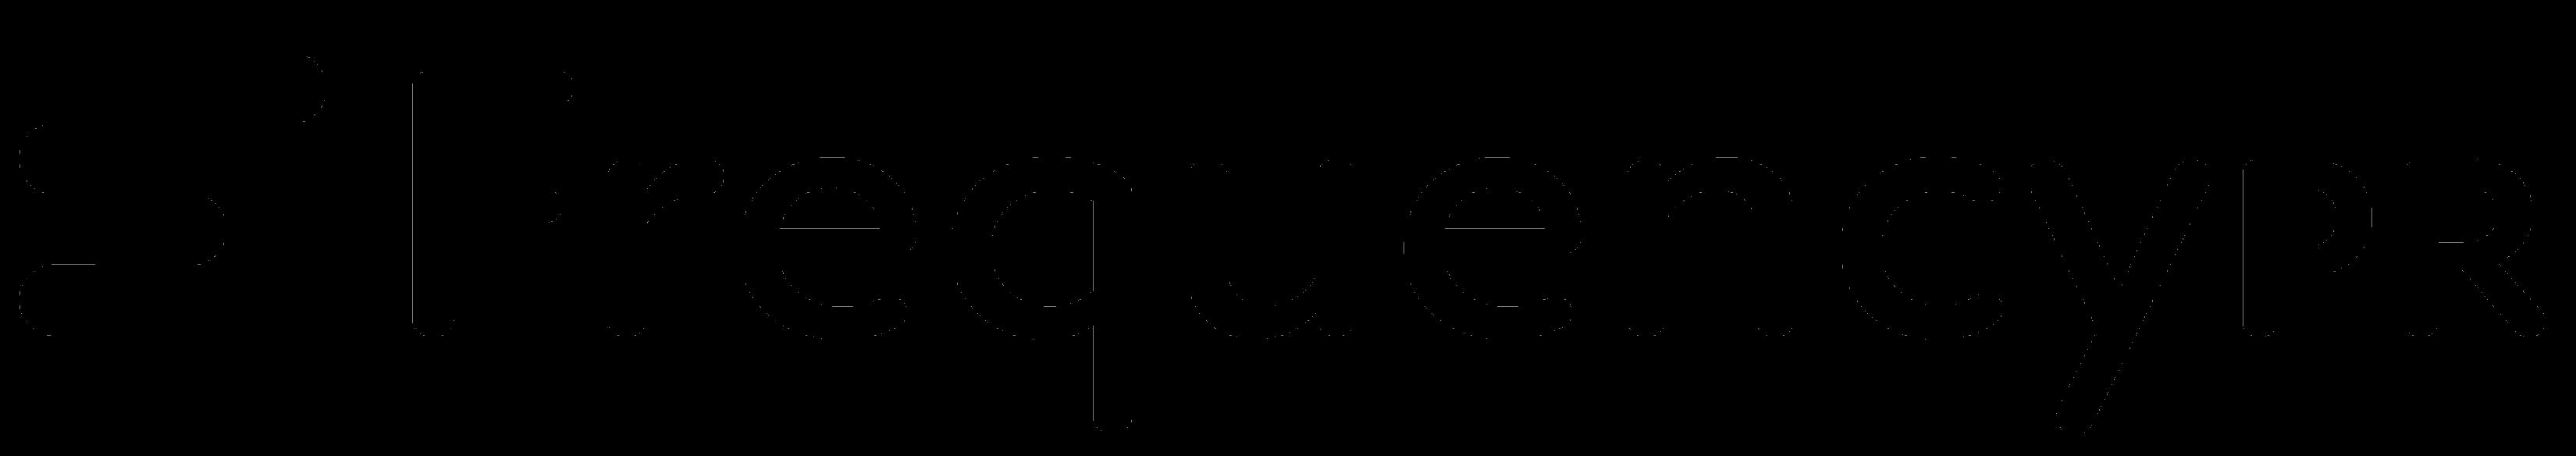 Frequencypr